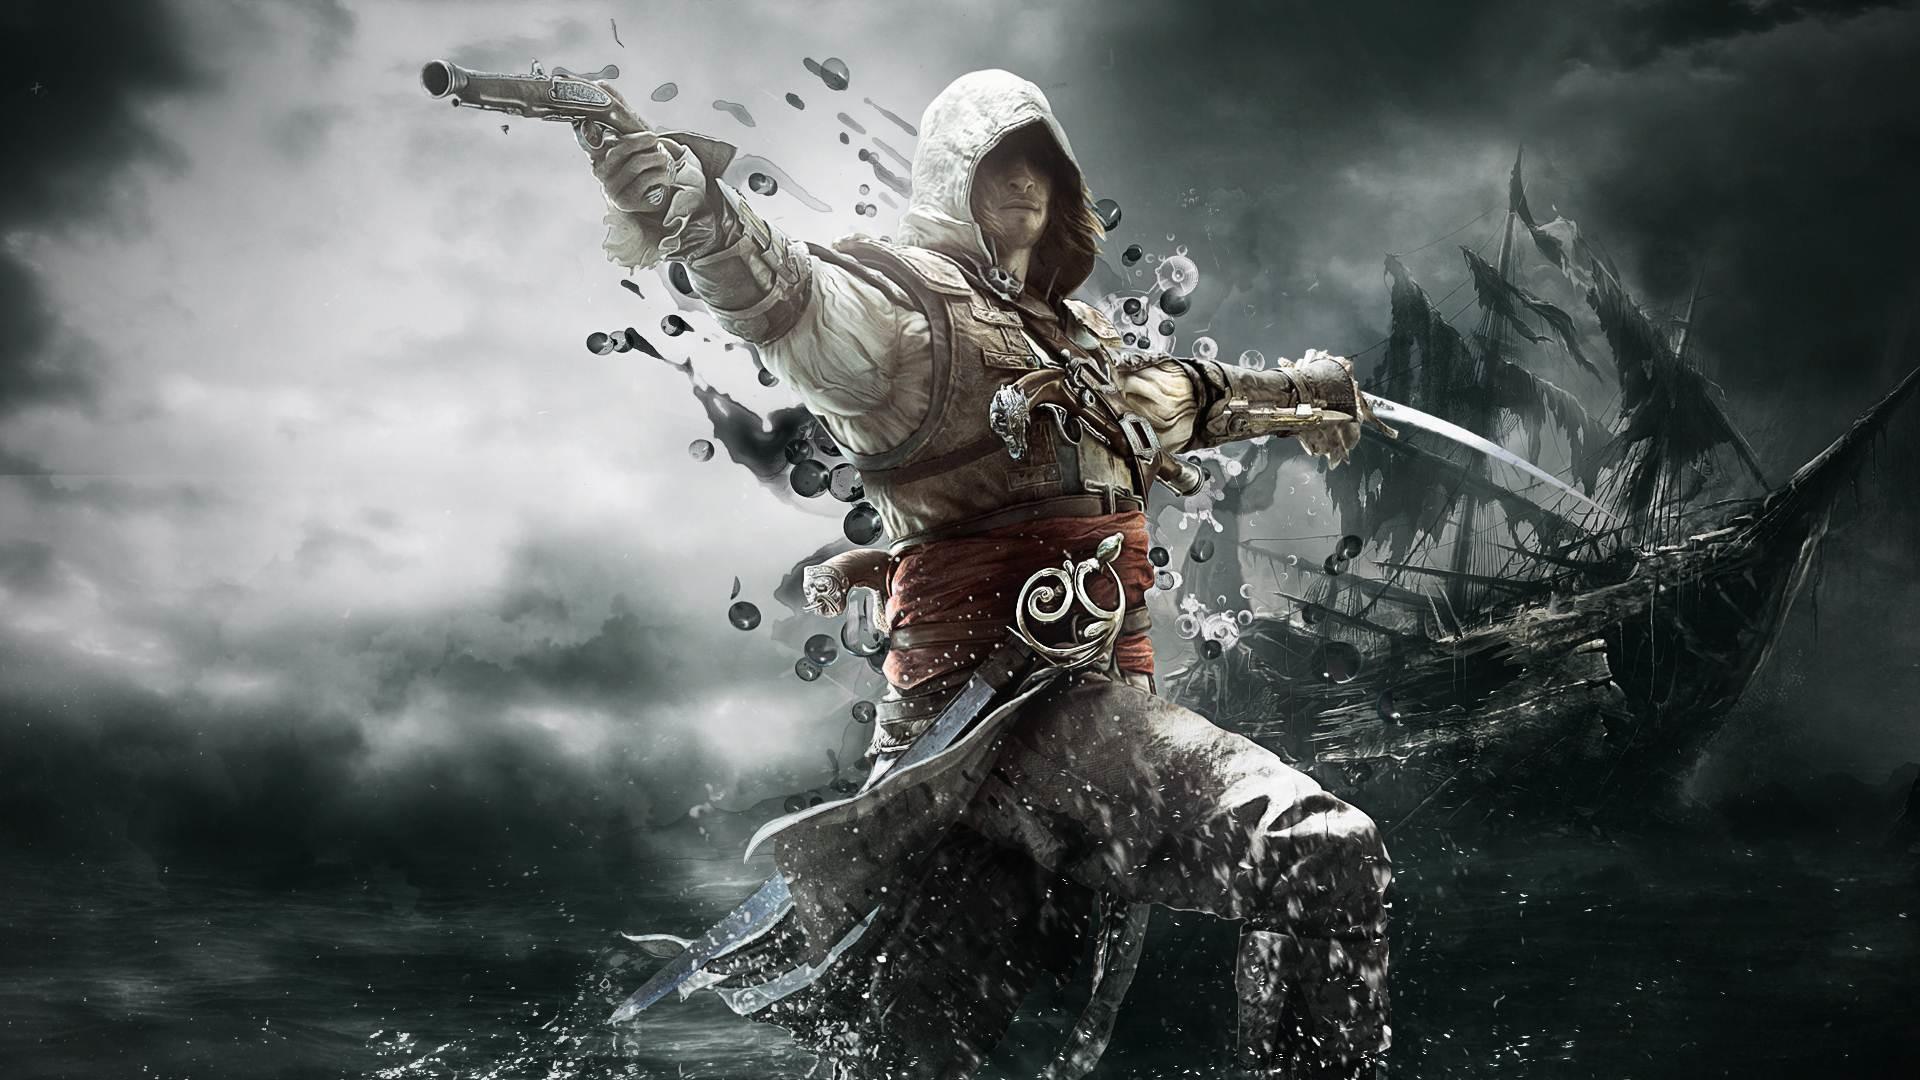 Assassin's Creed Wallpaper iphone   Assassins creed wallpaper   Assassins  creed Story   #28